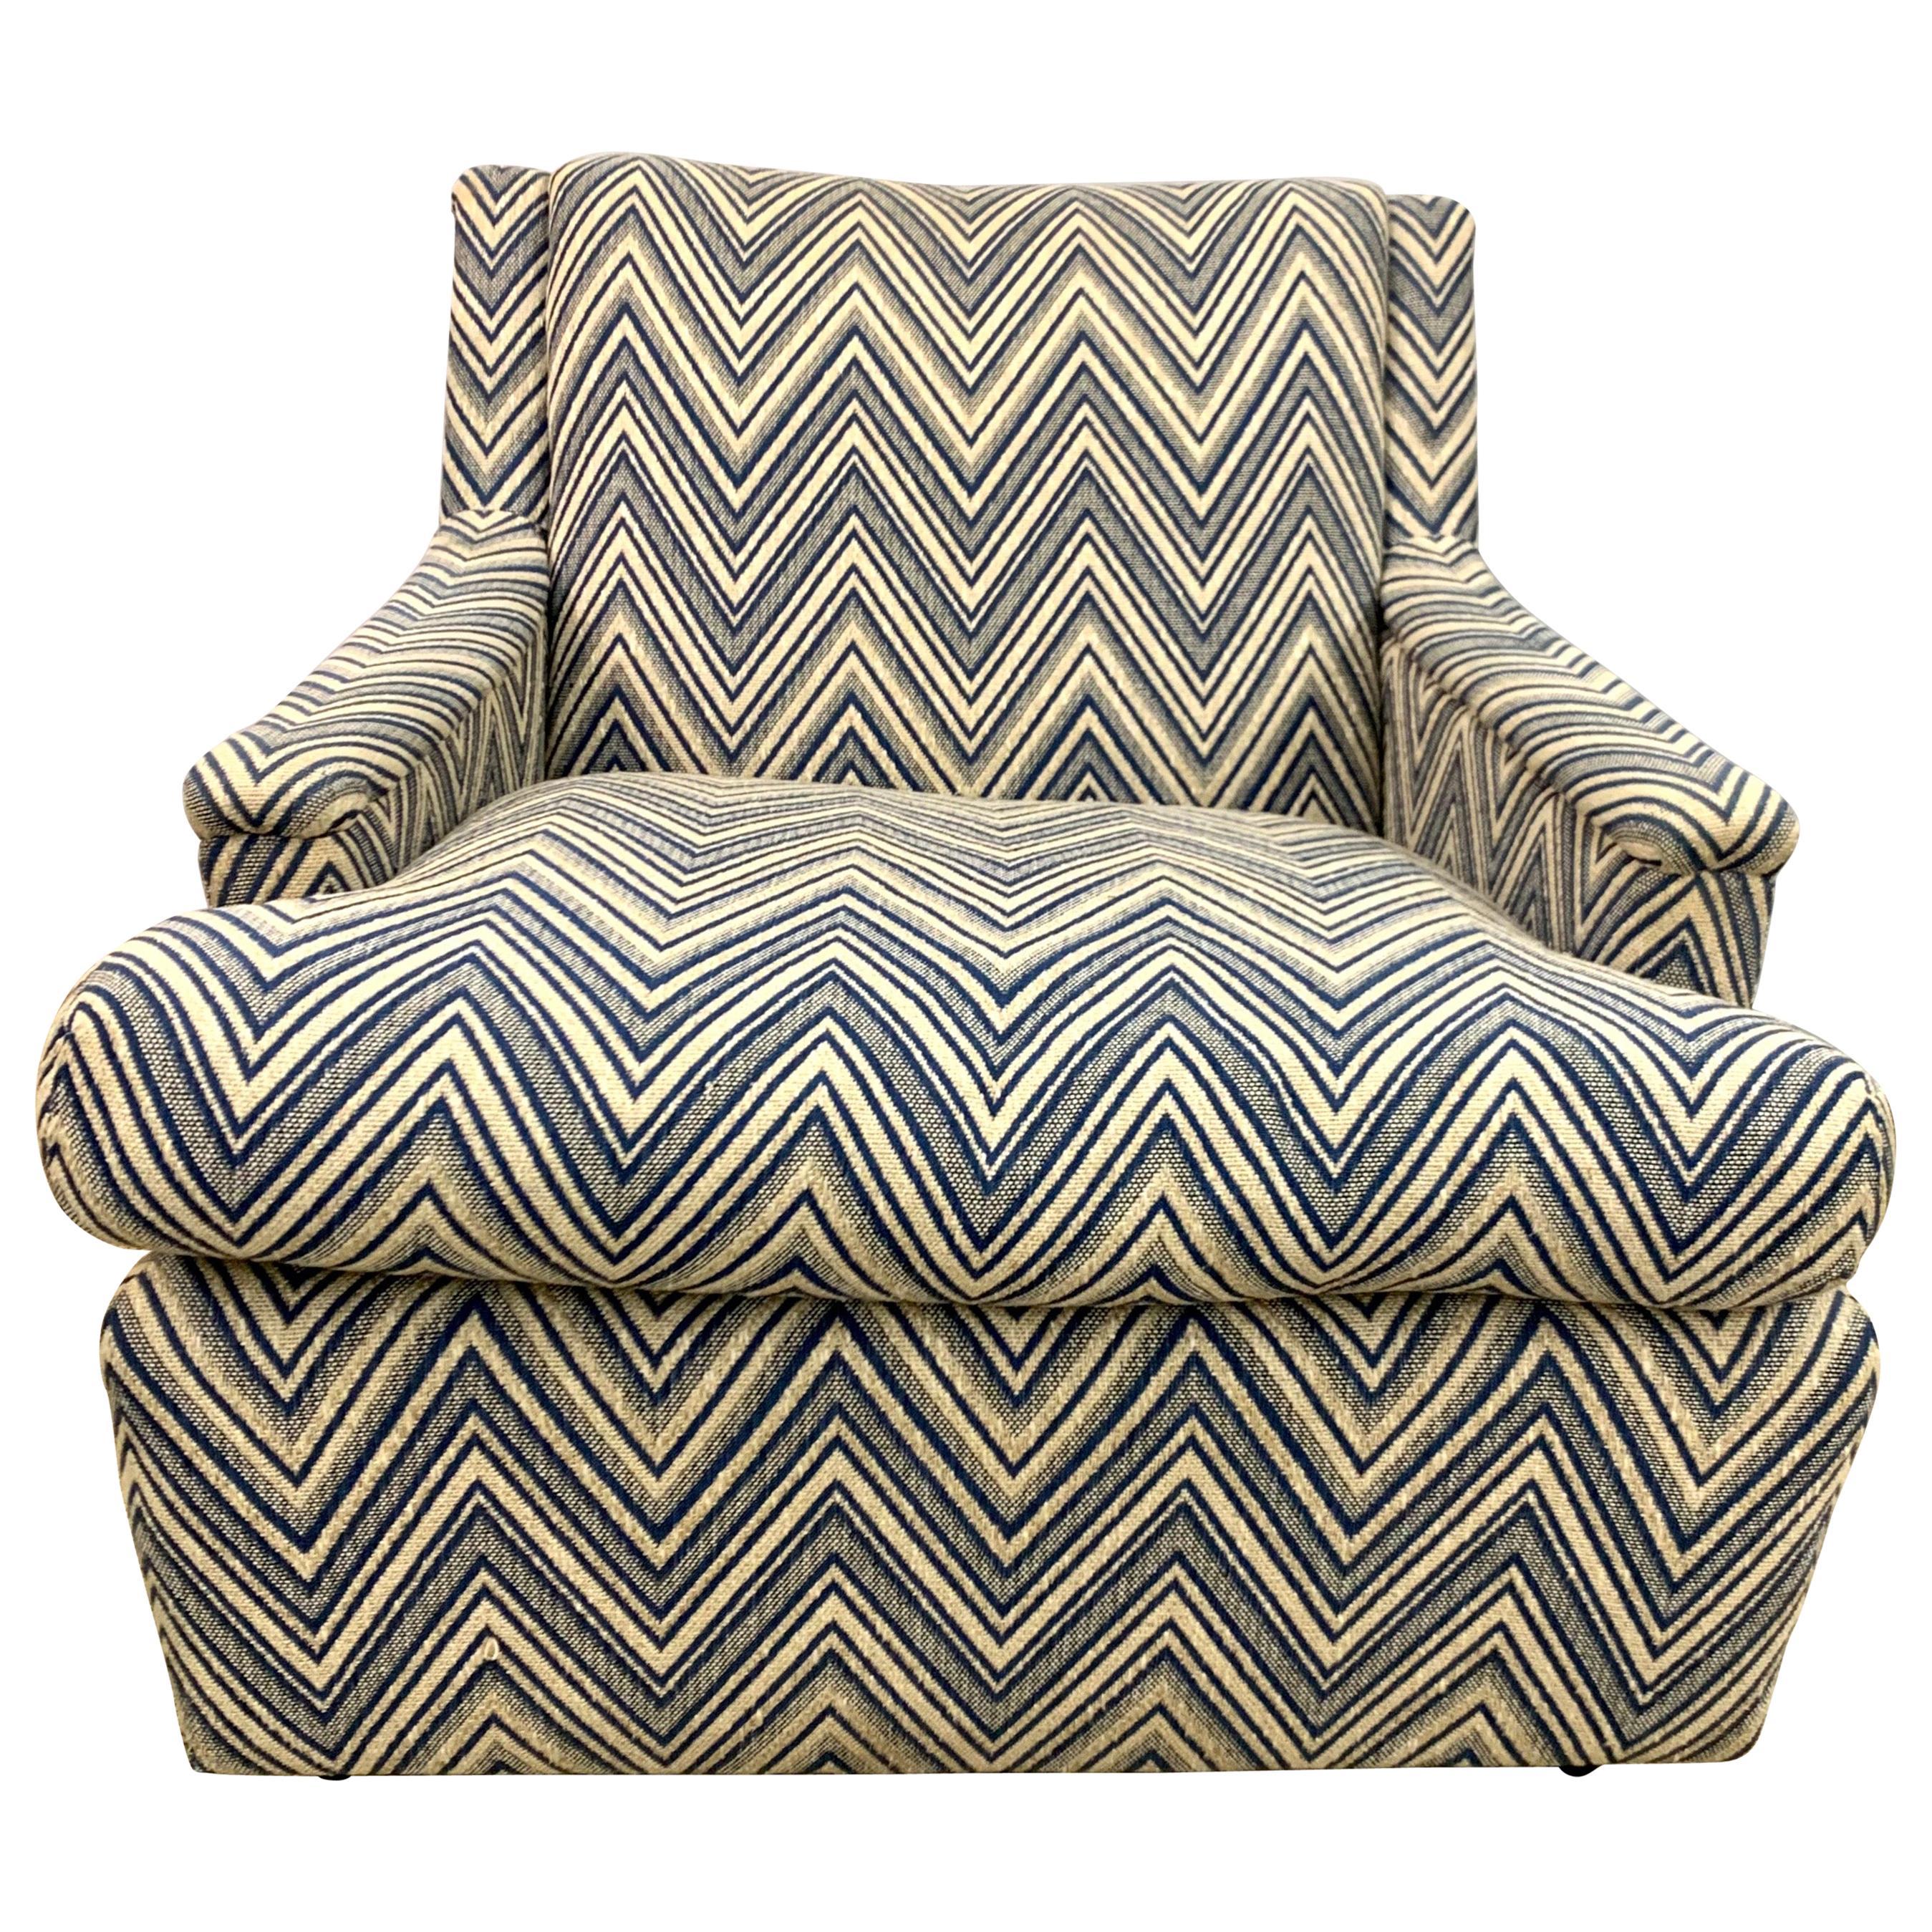 Mid-Century Modern Newly Upholstered Chevron Arm Chair Armchair